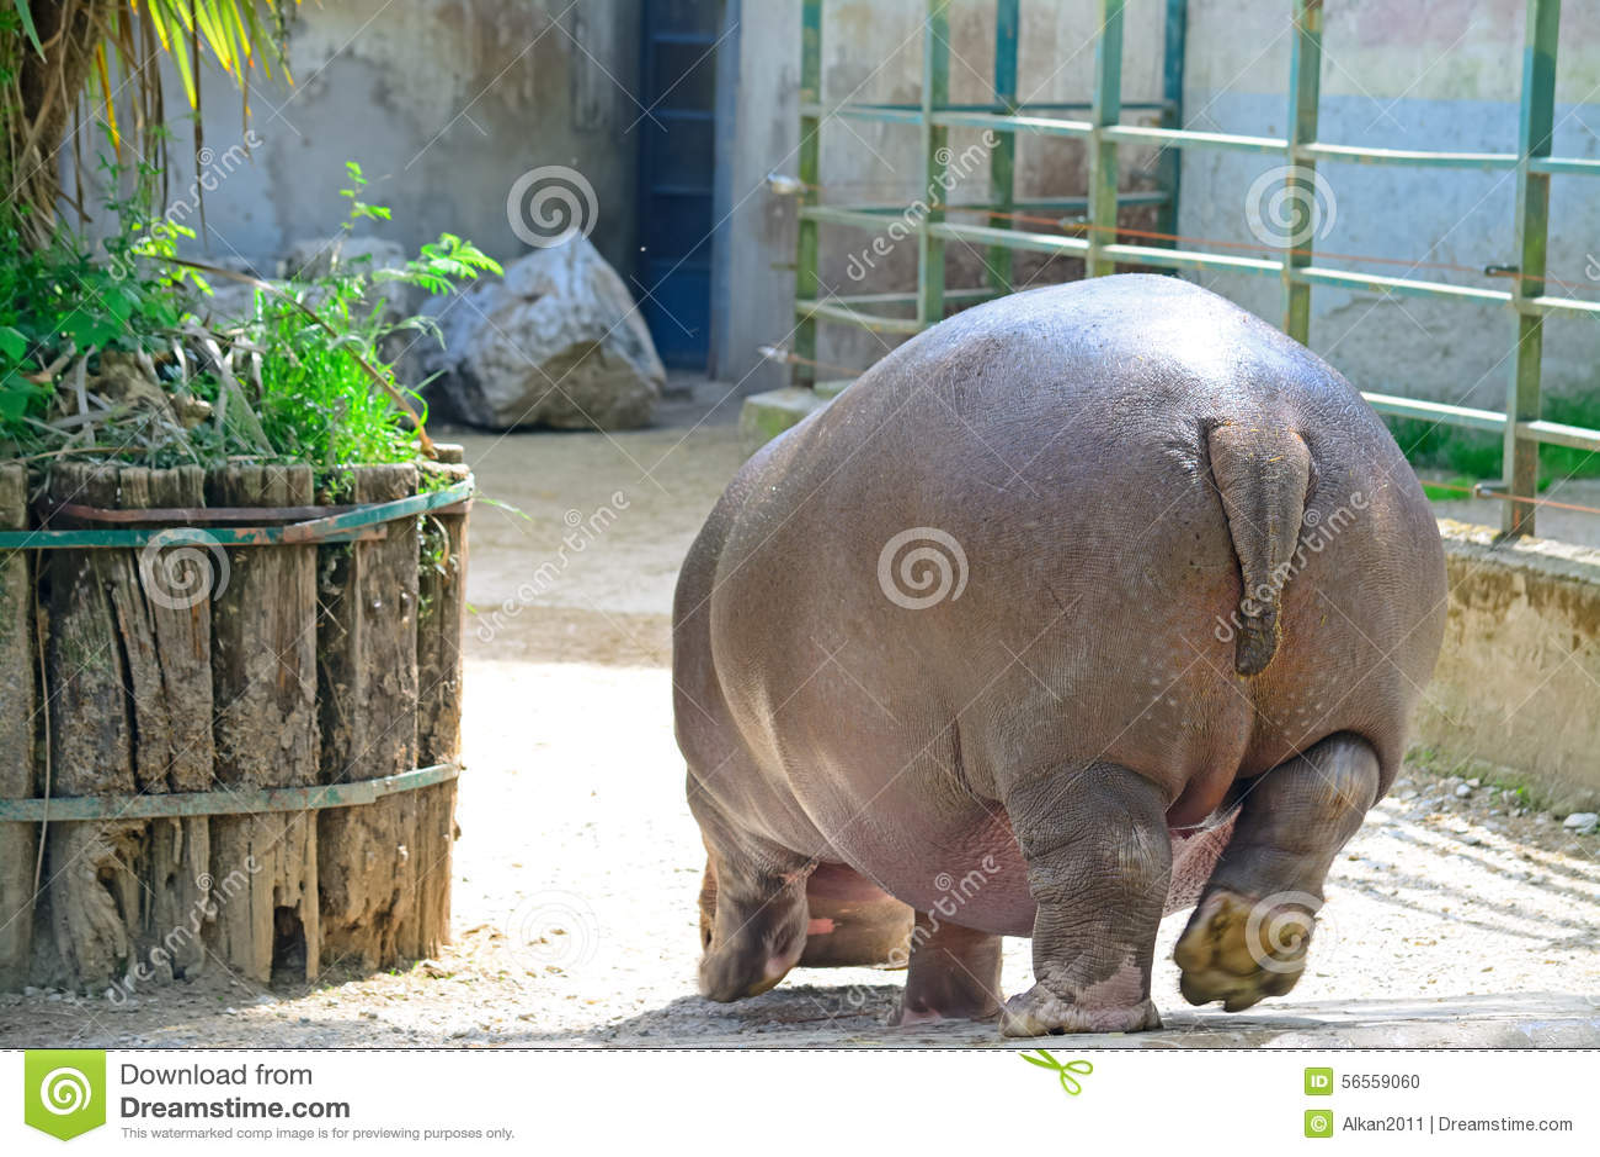 Download Hippopotamus που βλέπει από πίσω σε έναν ζωολογικό κήπο Στοκ Εικόνες - εικόνα από μεγάλη, ουρά: 56559060